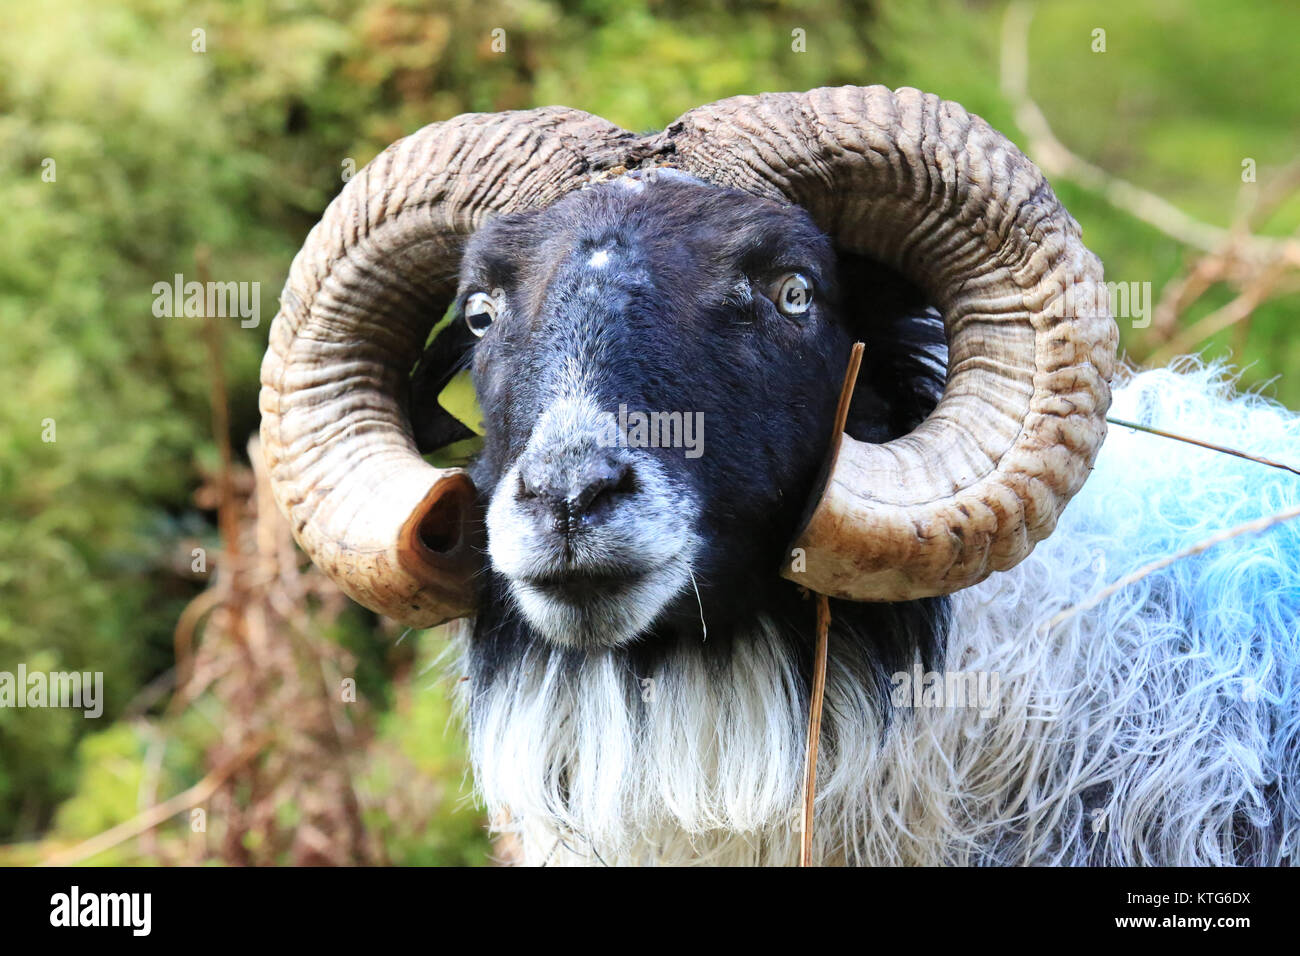 Ram sheep in natural habitat in Ireland - Stock Image